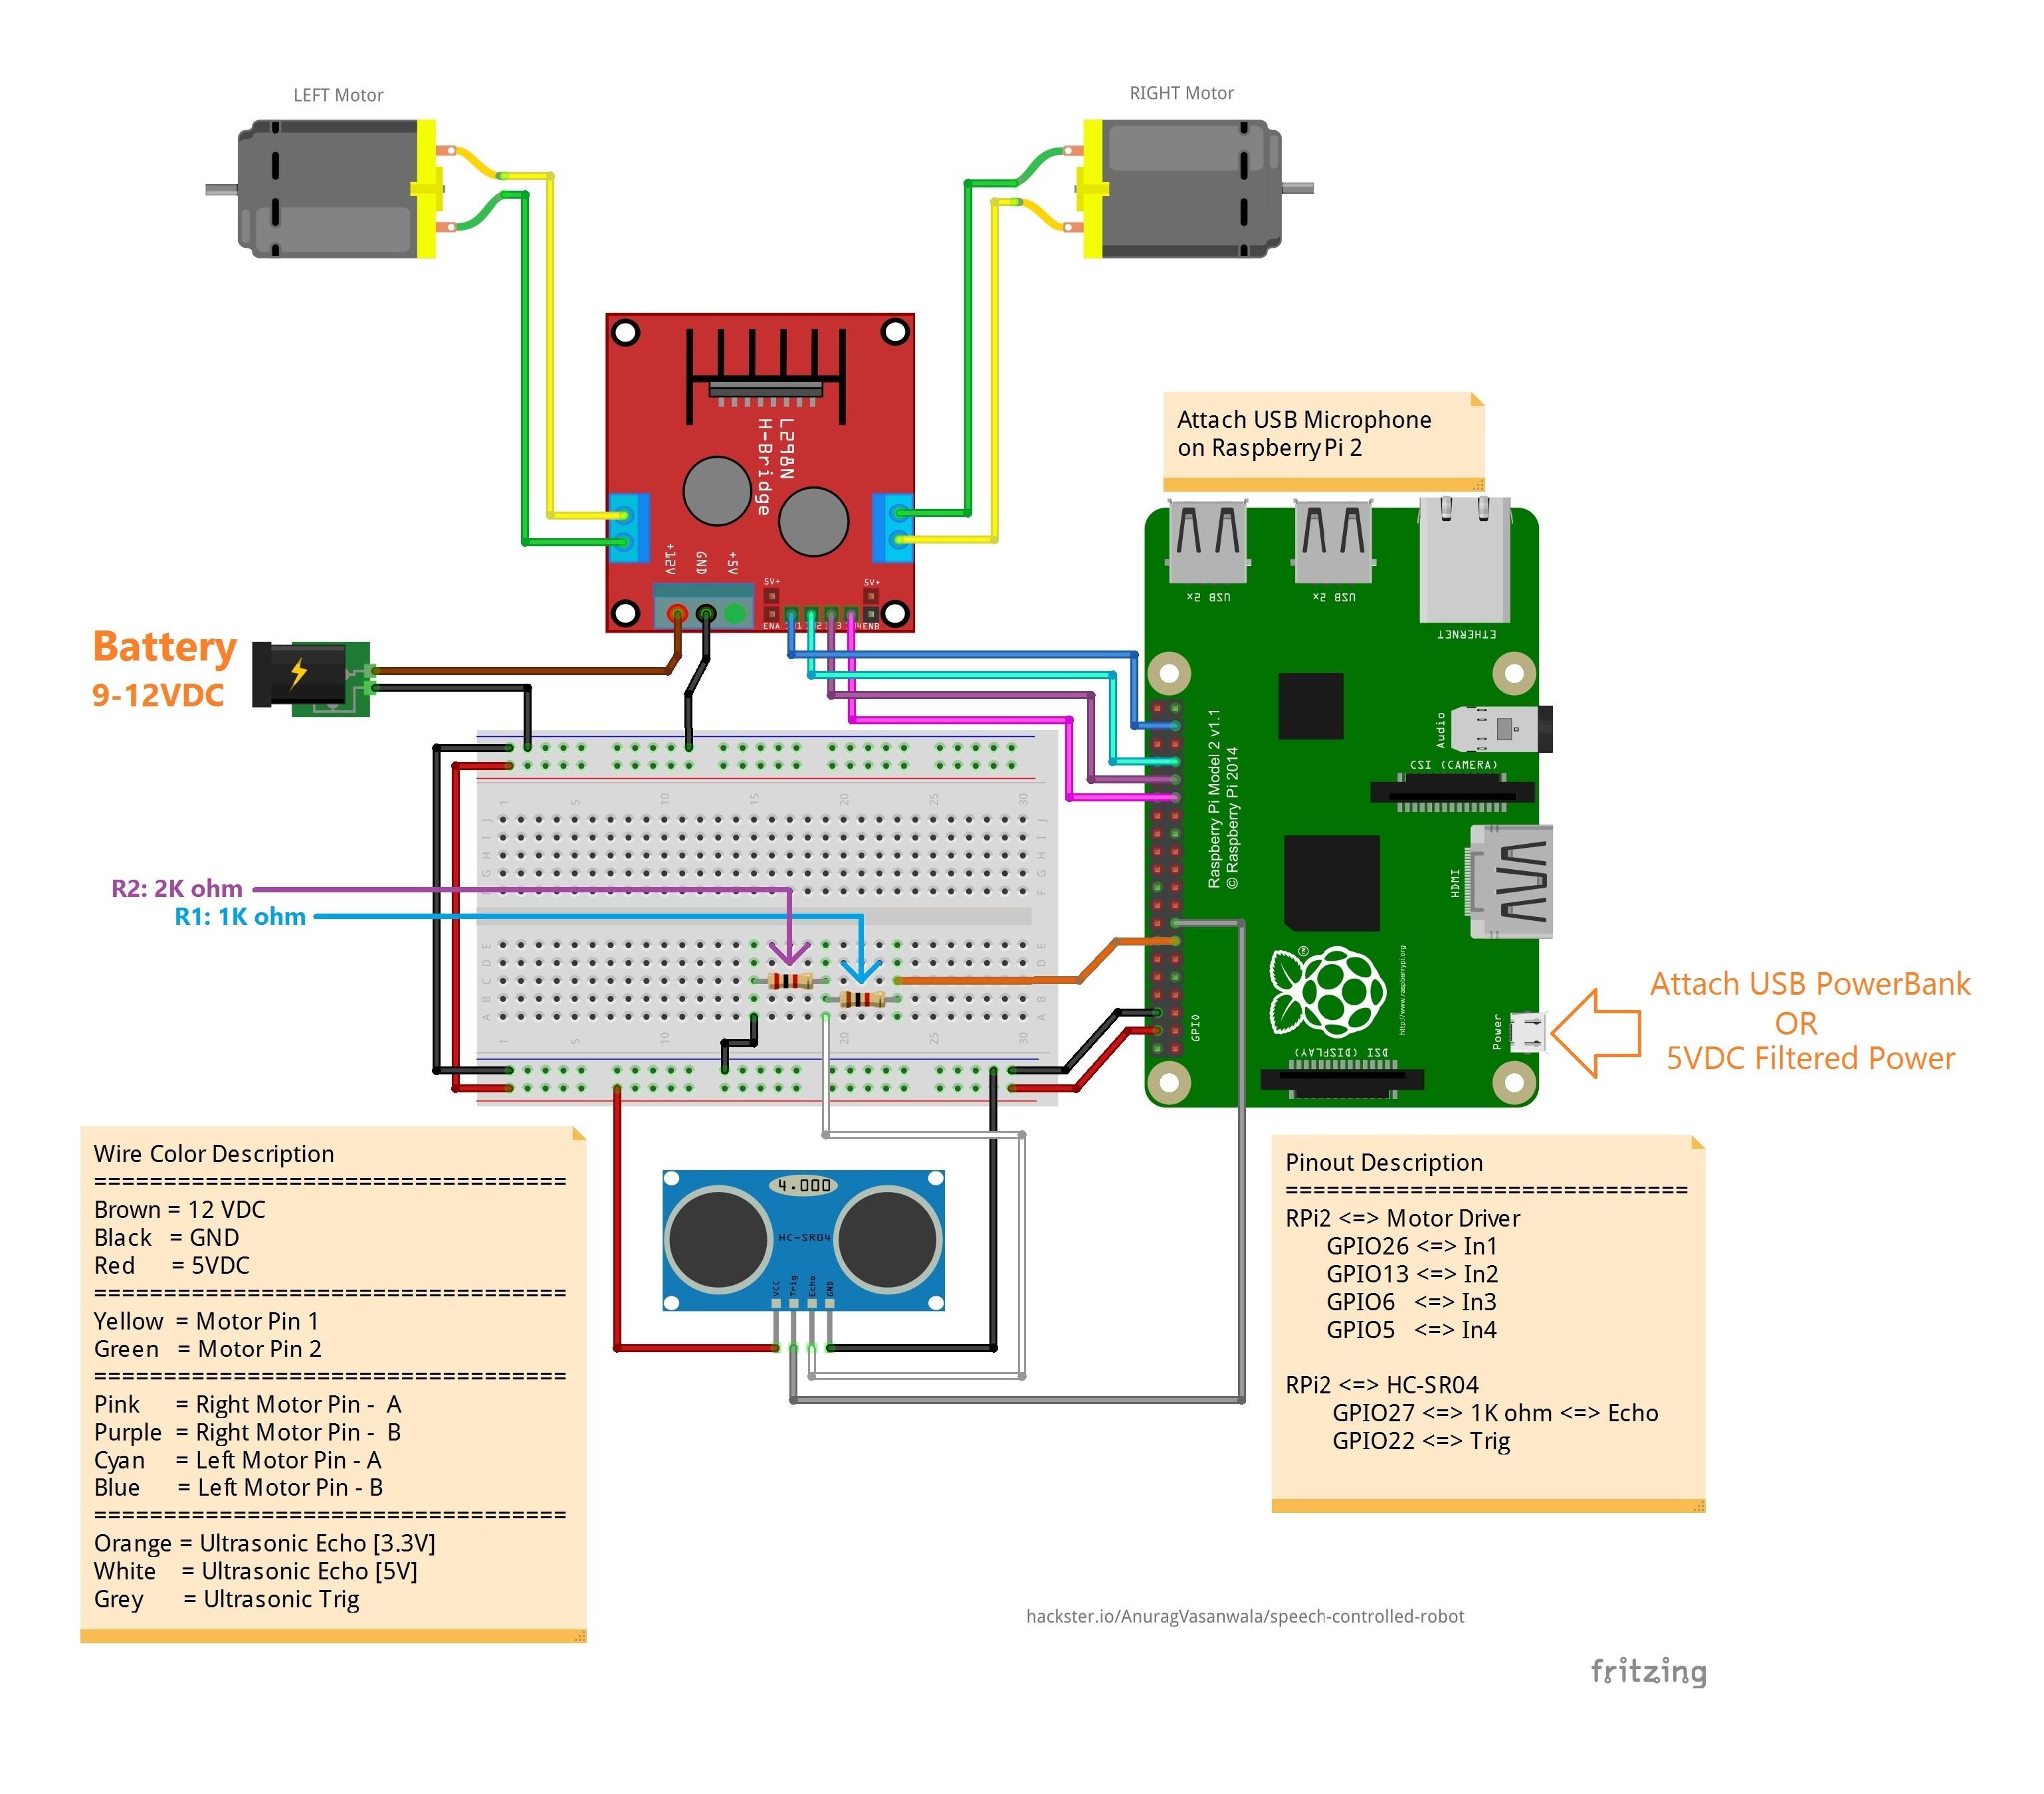 windows 10 iot core speech controlled robot hacksterio